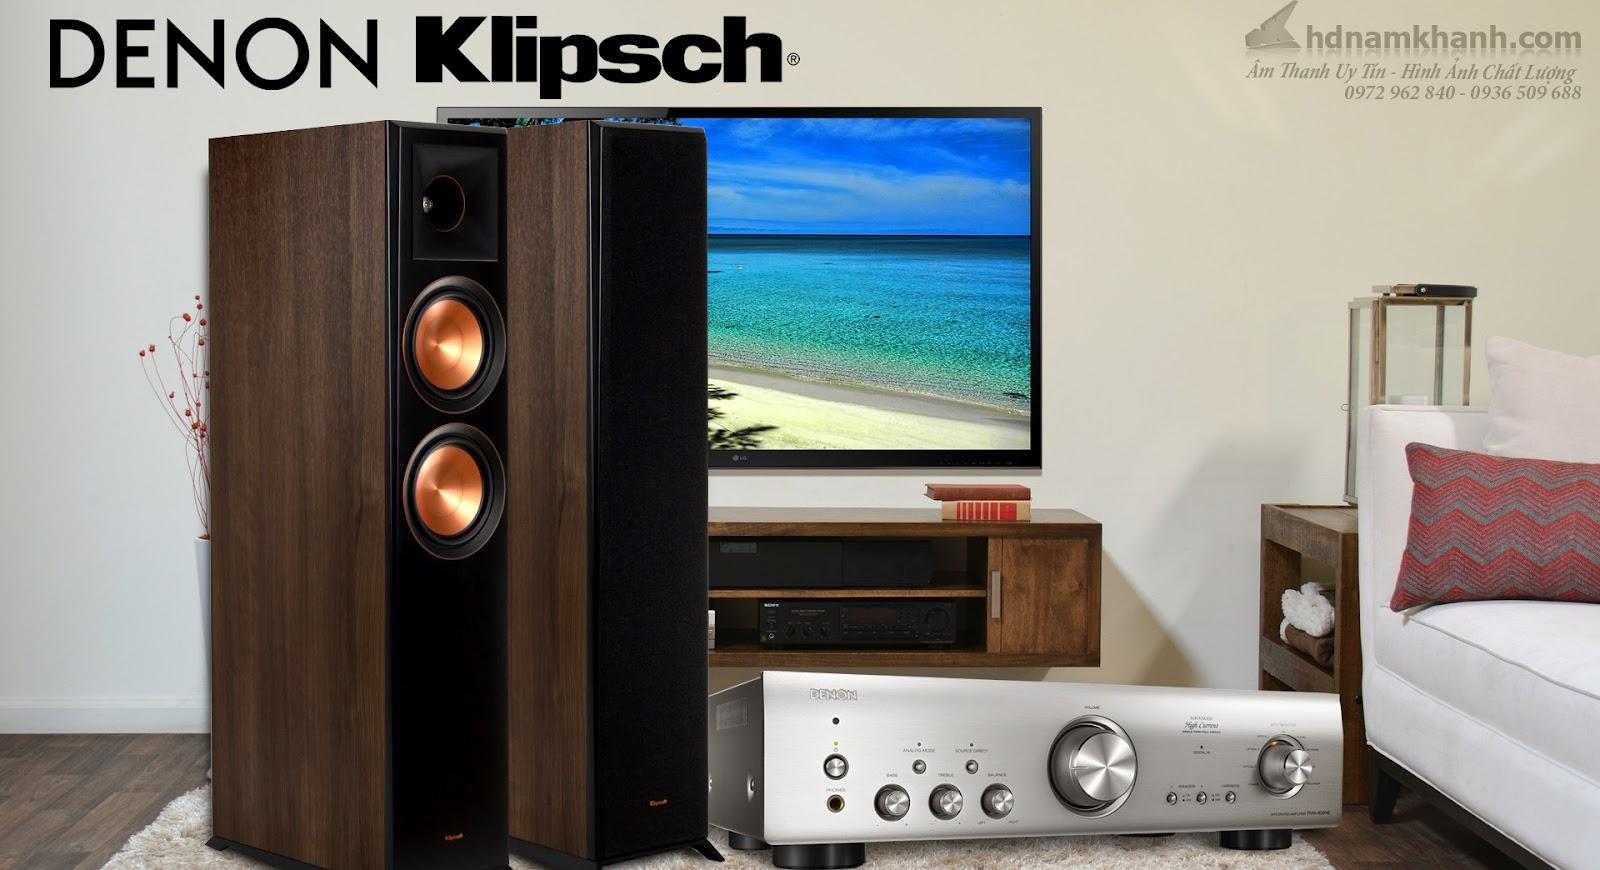 Bộ Hi-fi Amply Denon PMA 800NE + Loa Klipsch RP 5000F